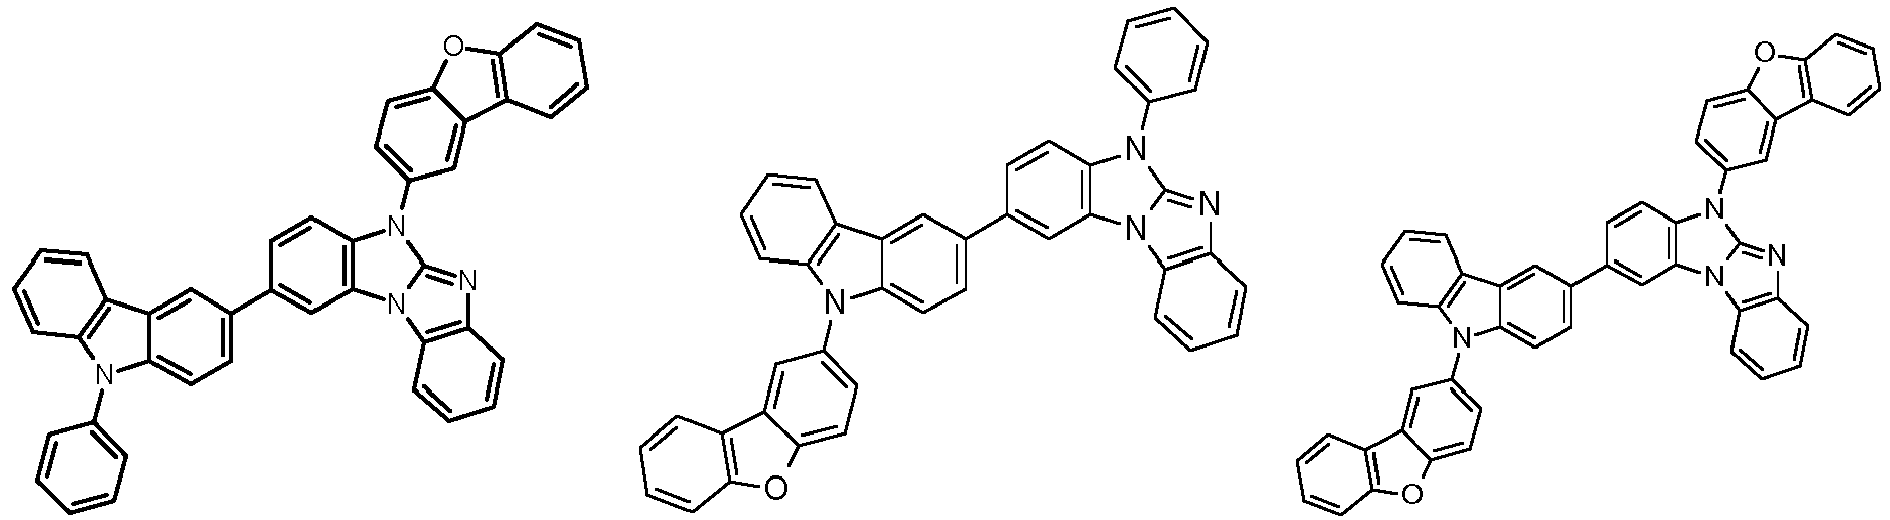 Figure imgb0836